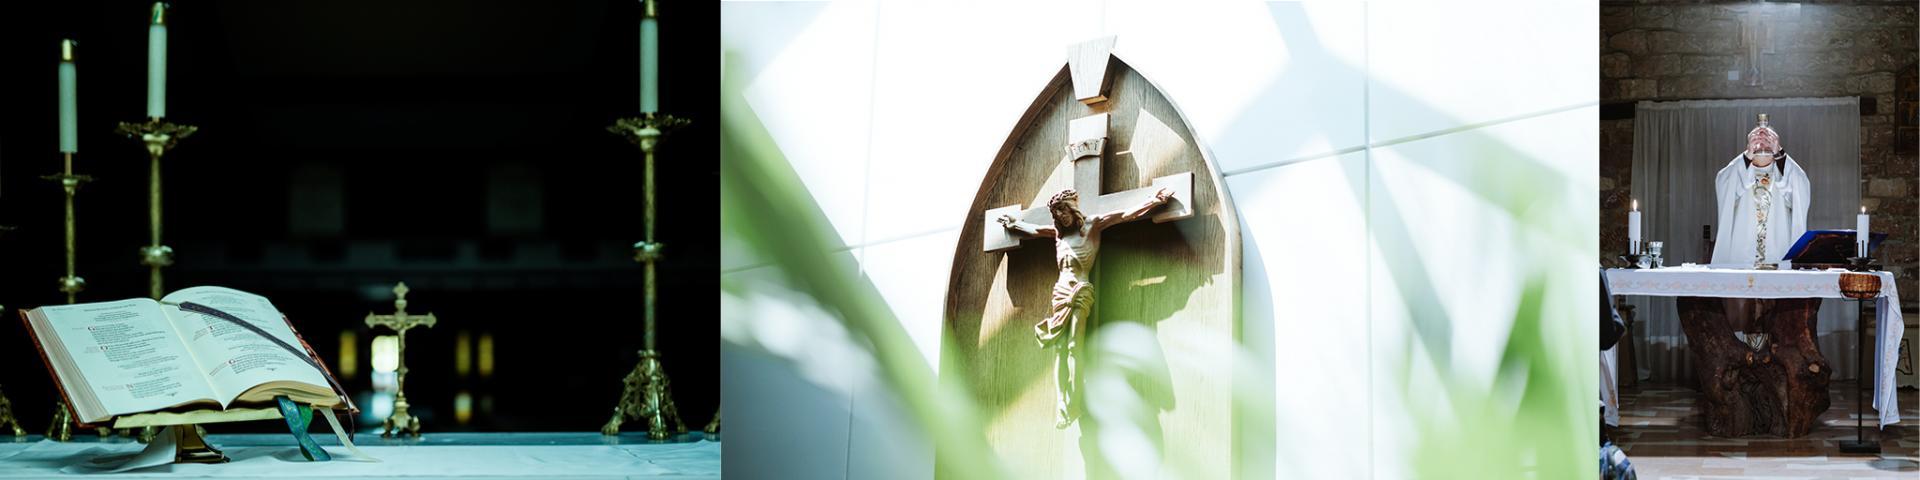 Cross, Roman Missal, priest